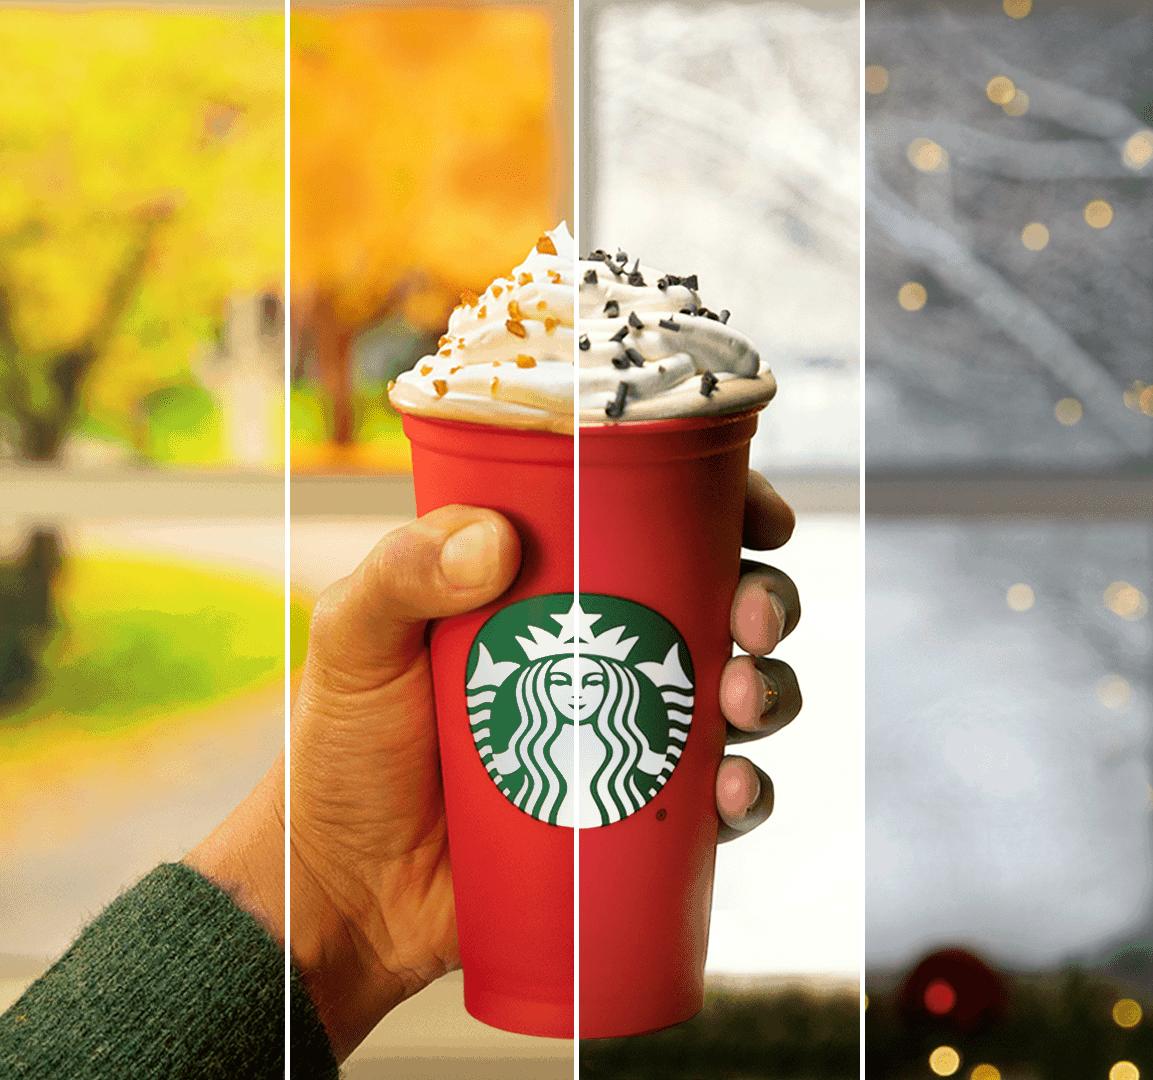 Starbucks: Gift $10, get $10 bonus via MasterCard